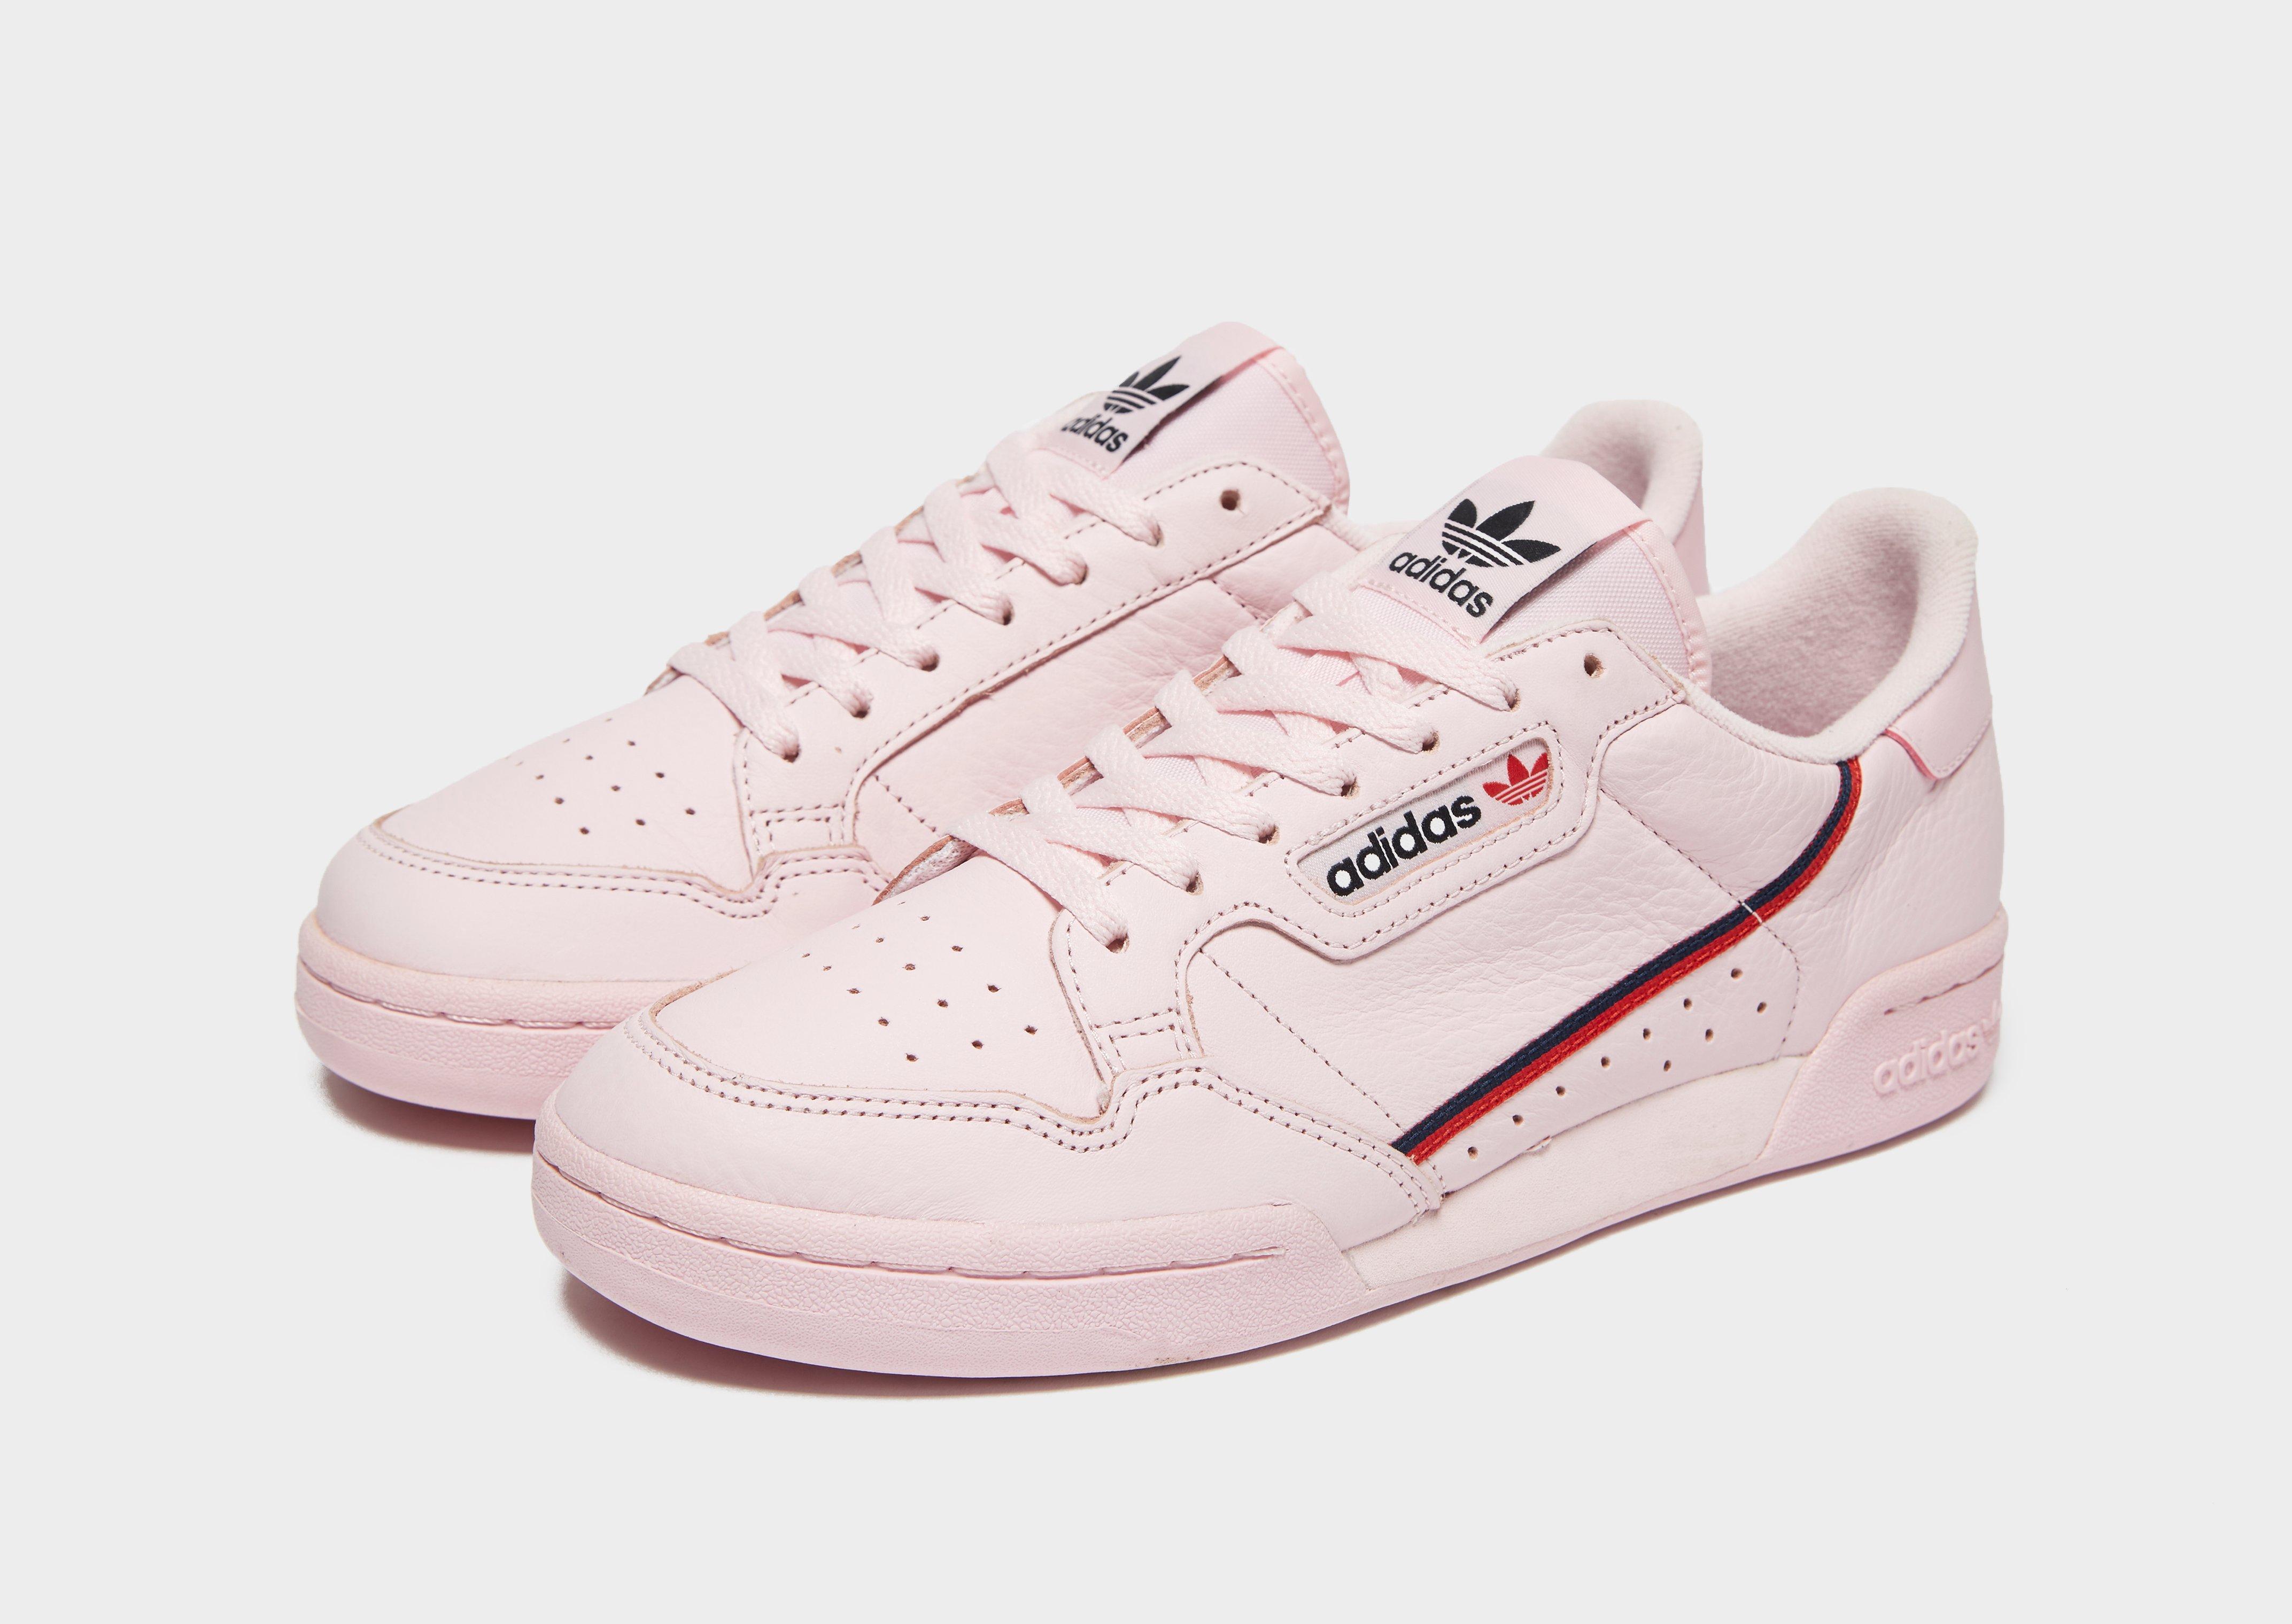 online store e919a b2563 Adidas Originals - Pink Continental 80 for Men - Lyst. View fullscreen